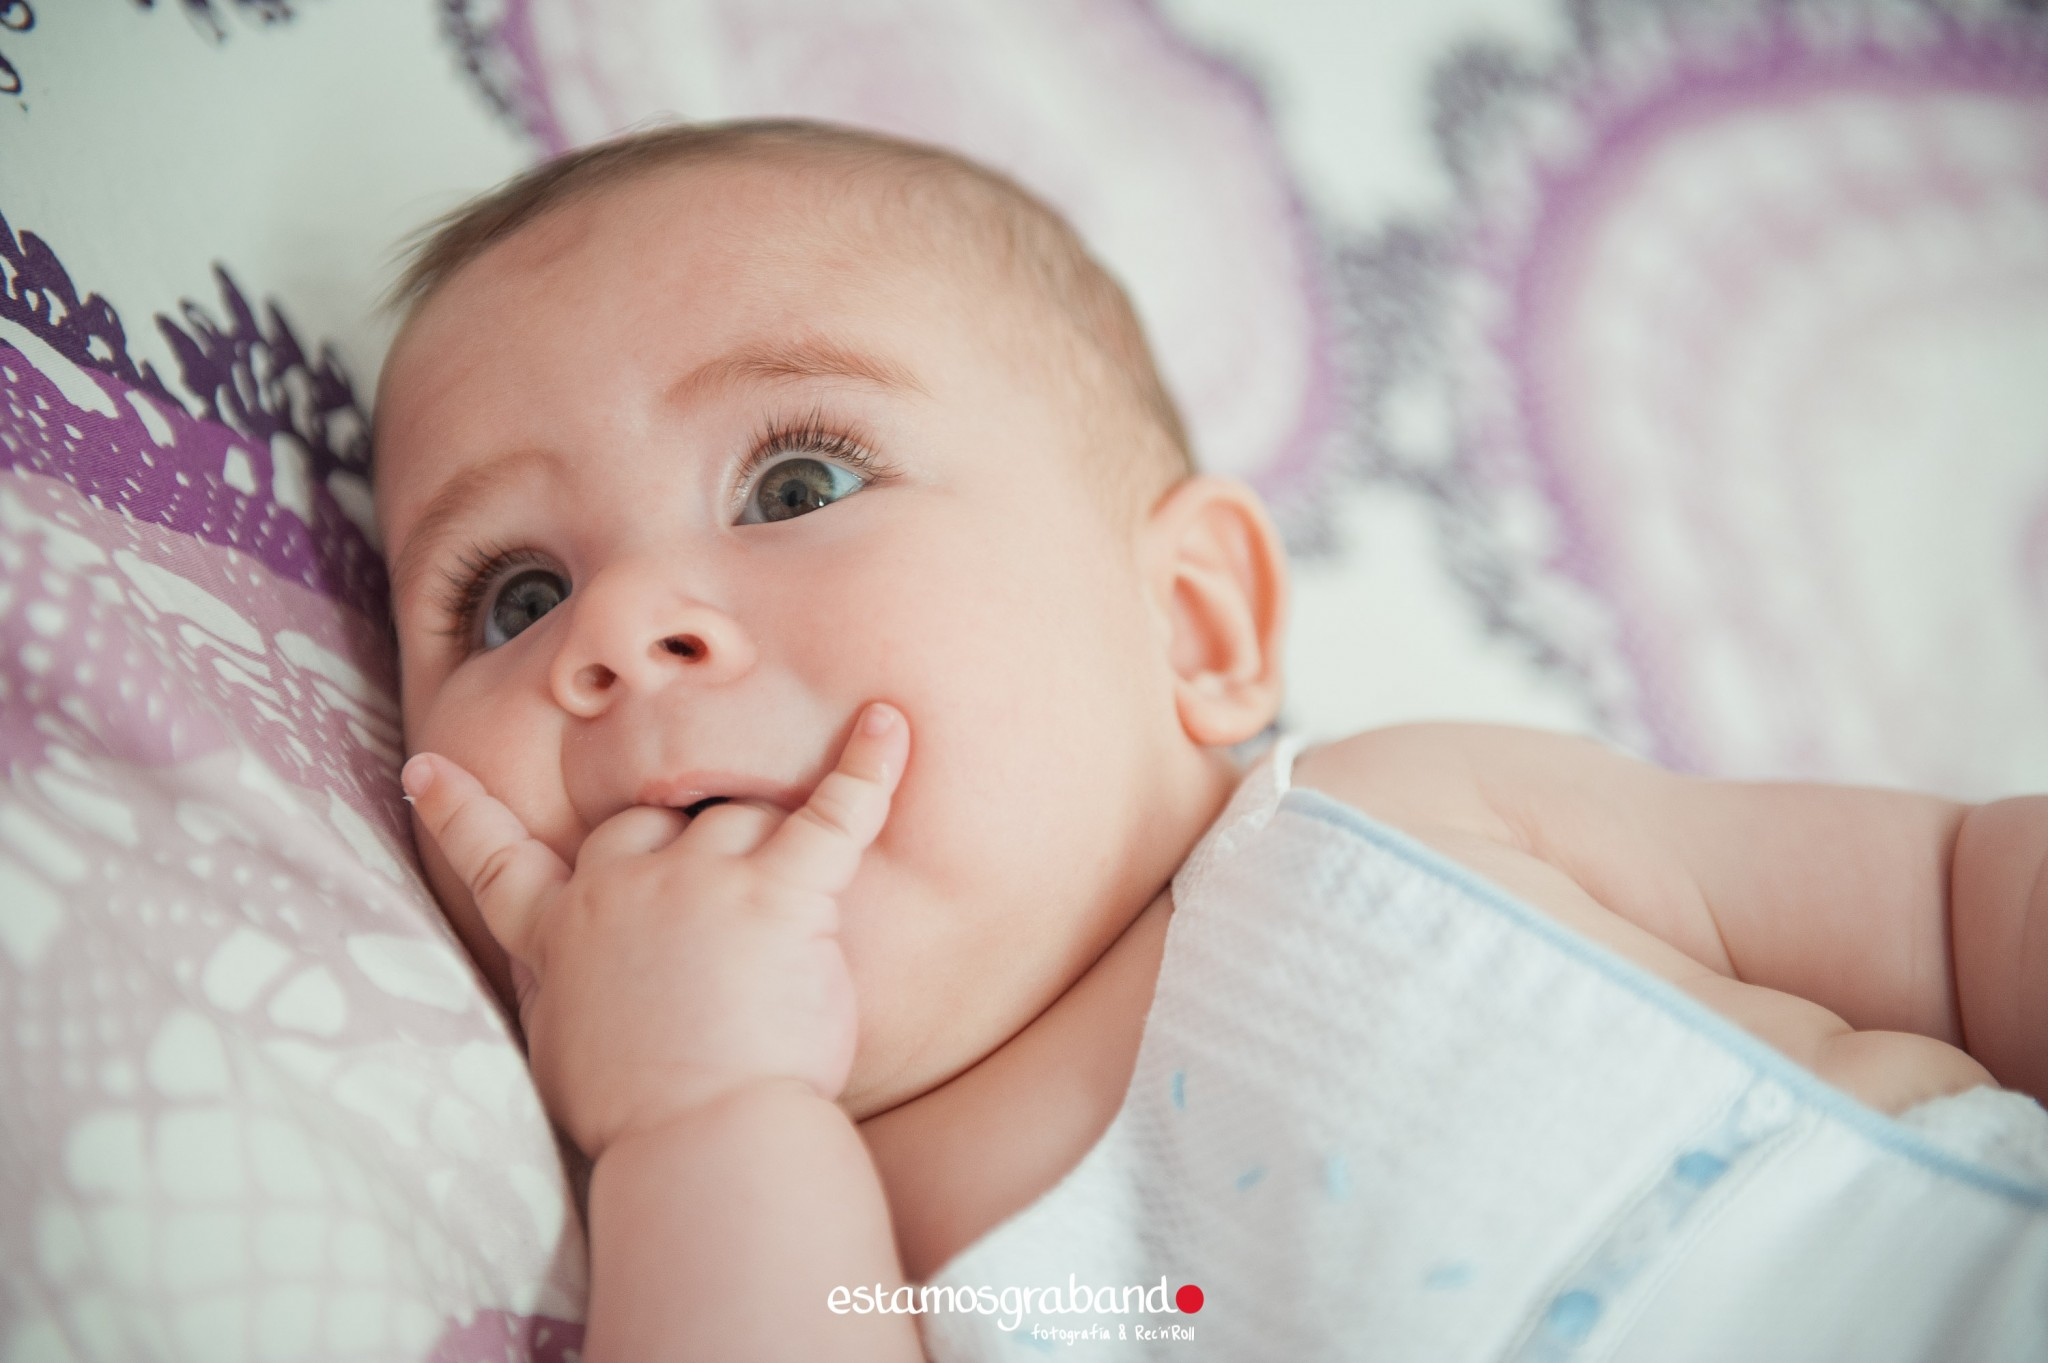 sesion-baby-pablo-newborn-fotografia-jerez-fotografia-bautizo-baby-sesion-fotos-de-bebe-4 Melocomo - video boda cadiz